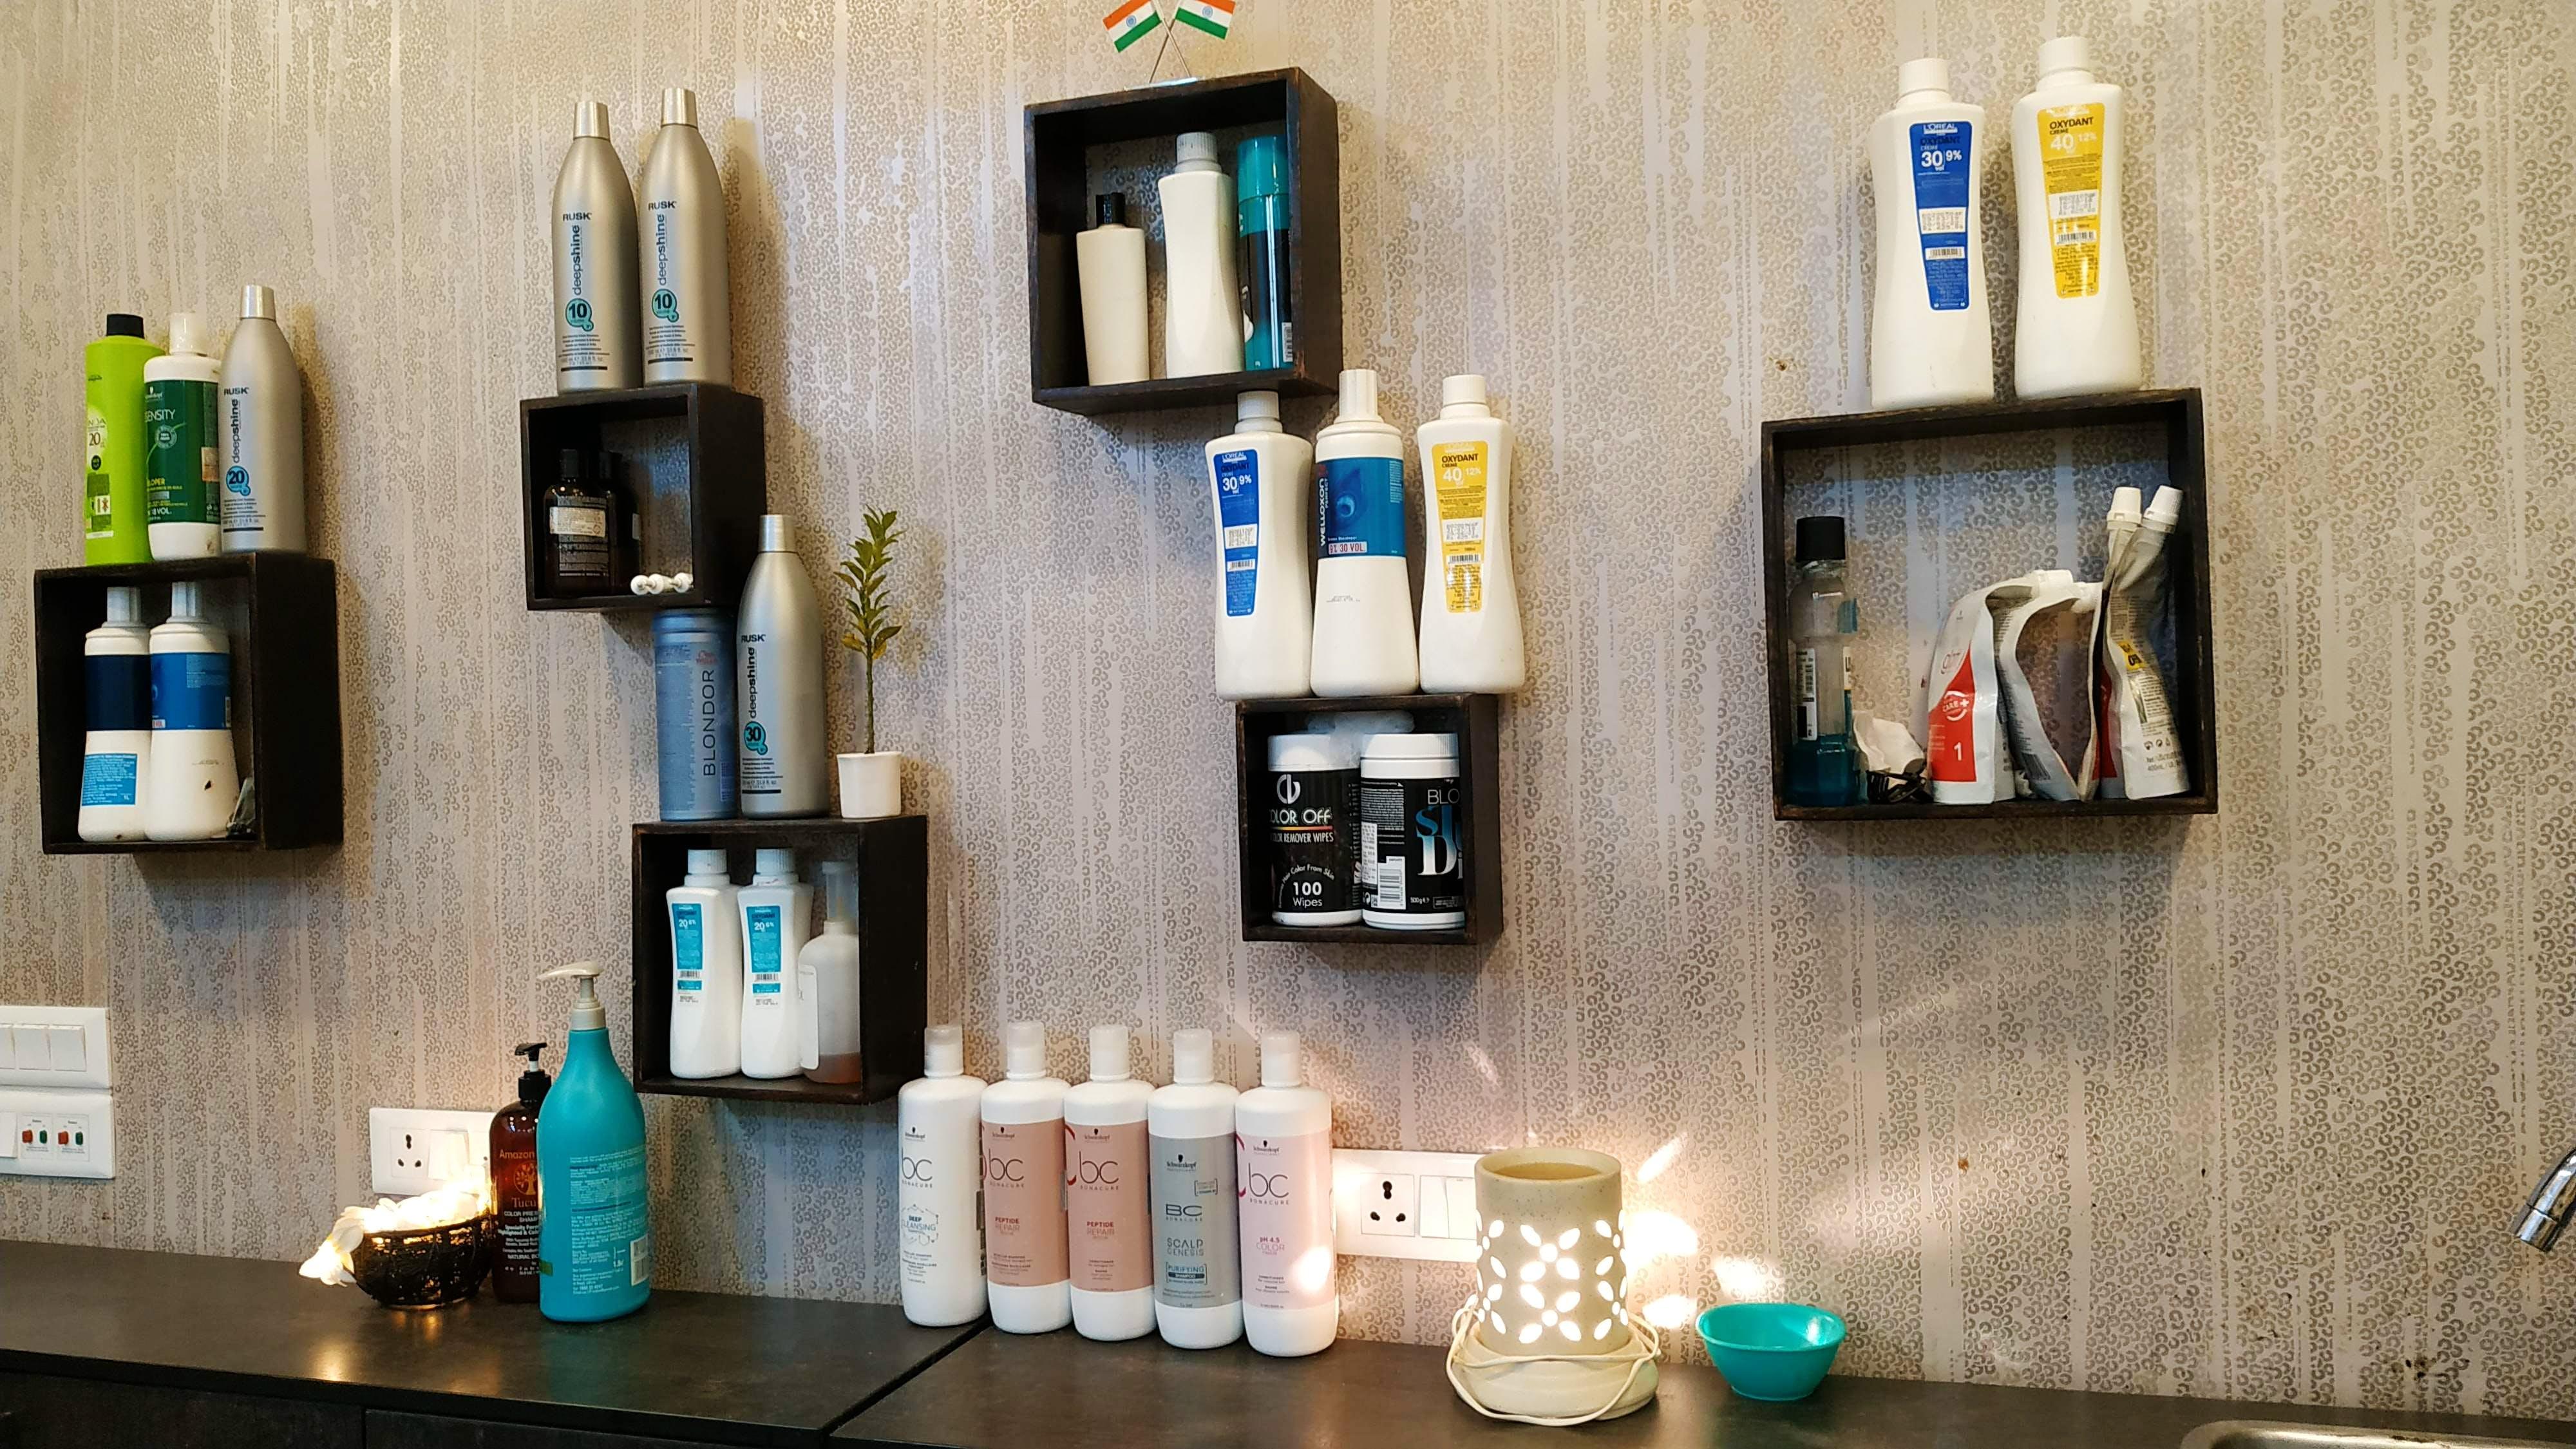 image - PonyUp Salon